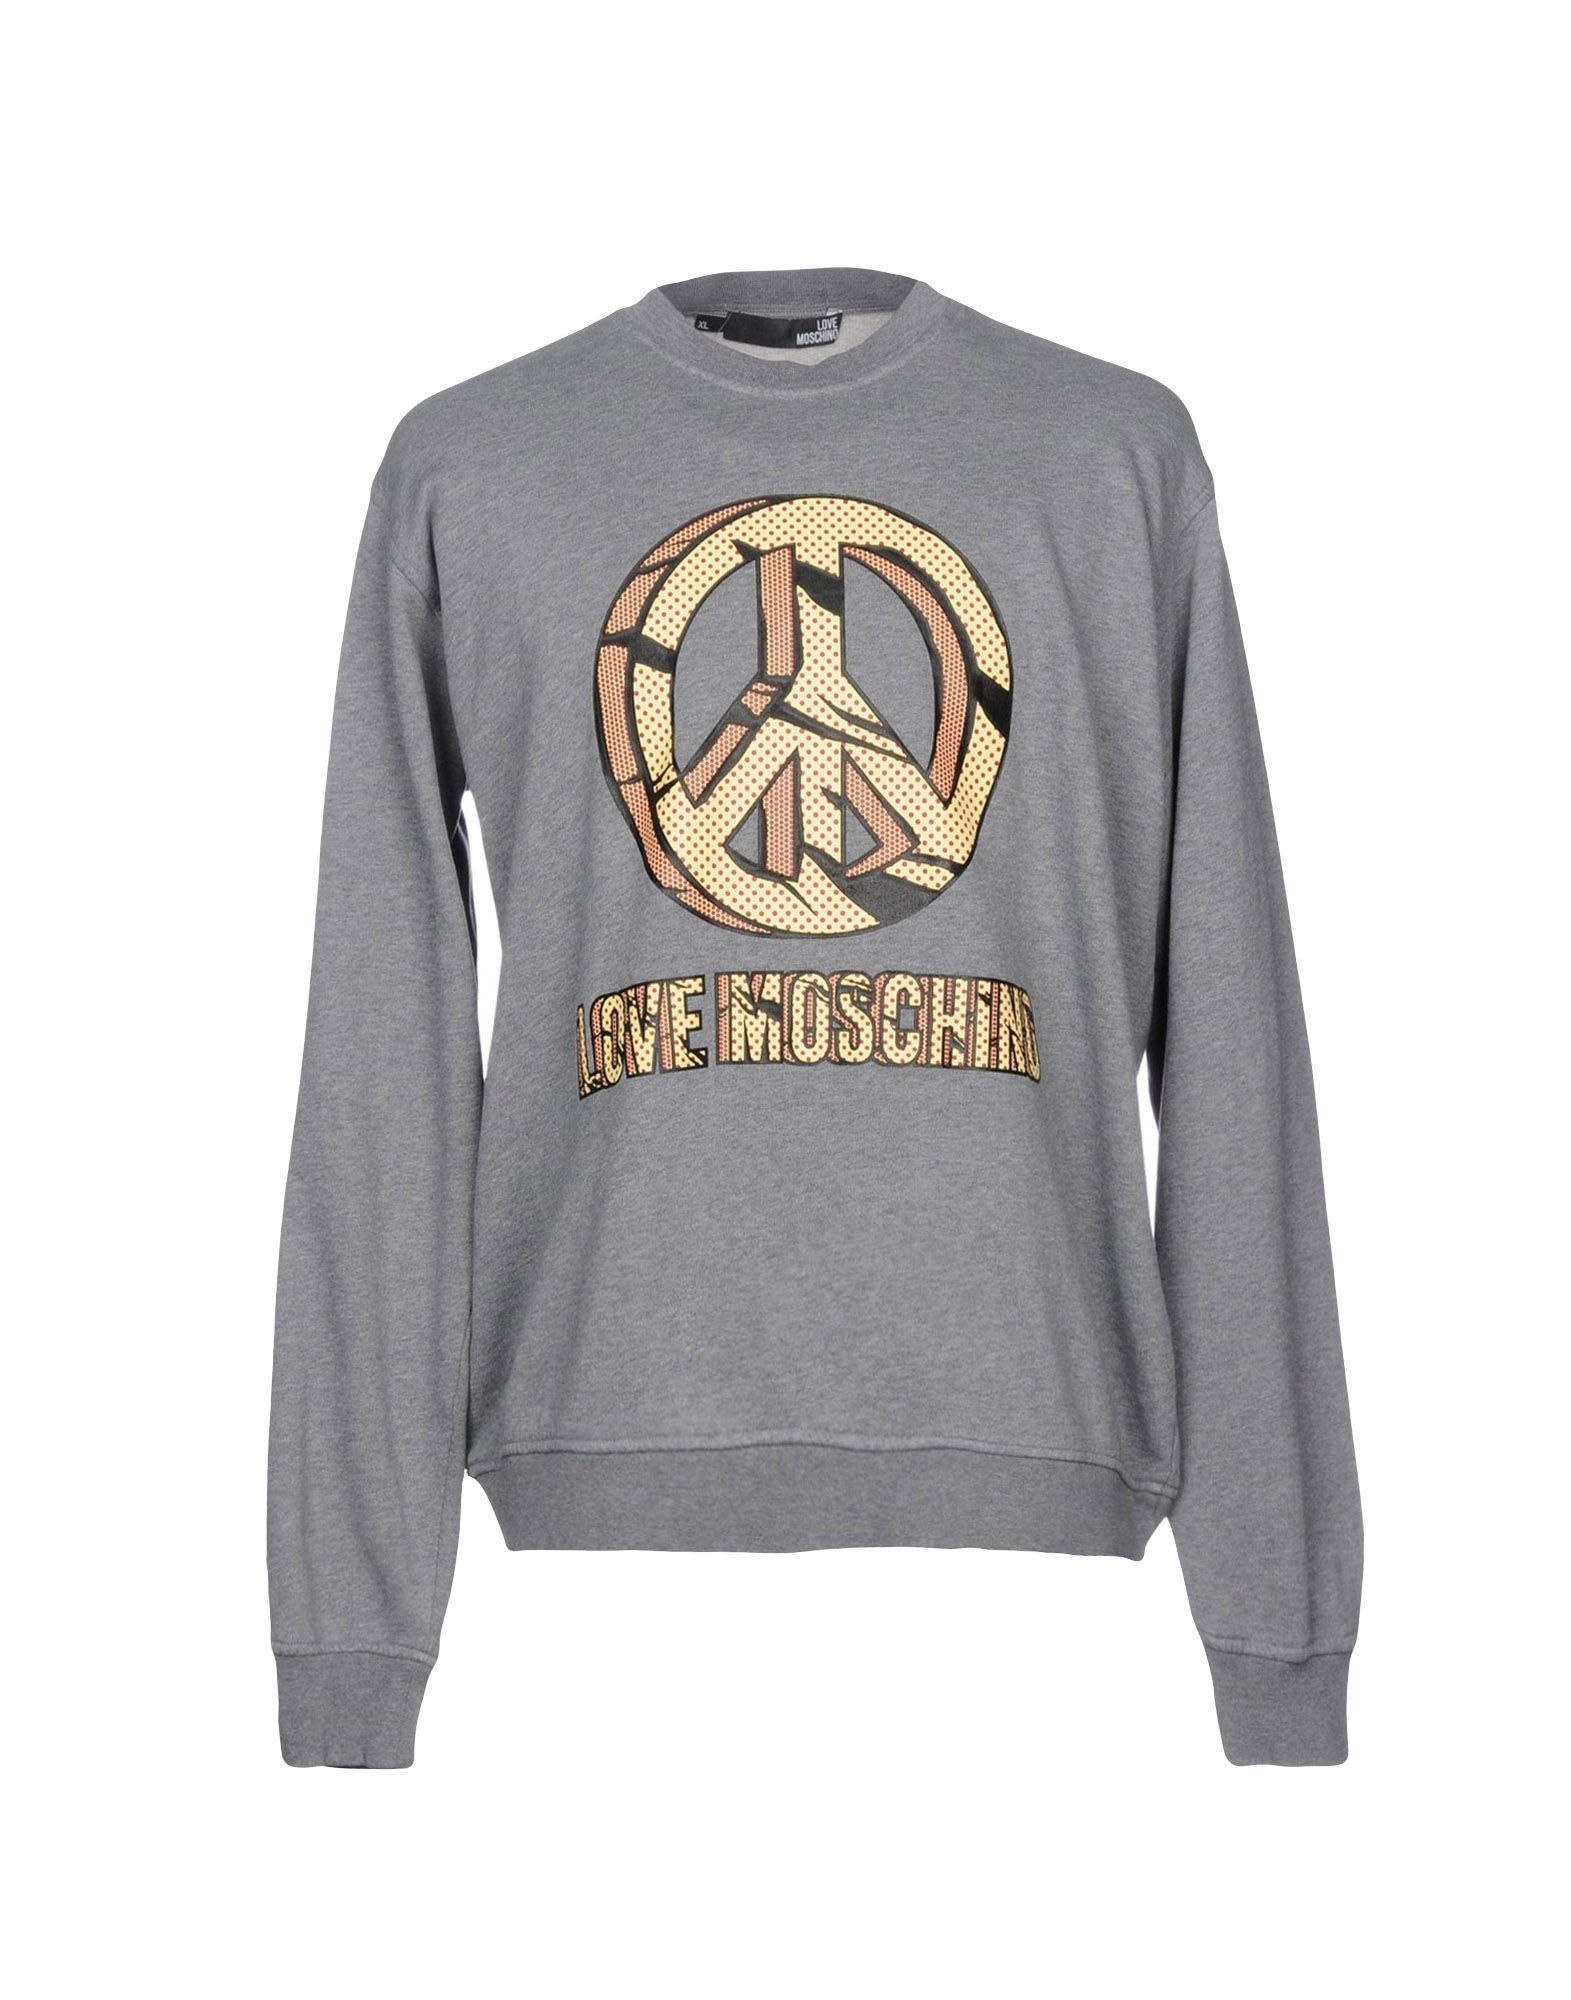 Love Moschino Sweatshirt In Grey